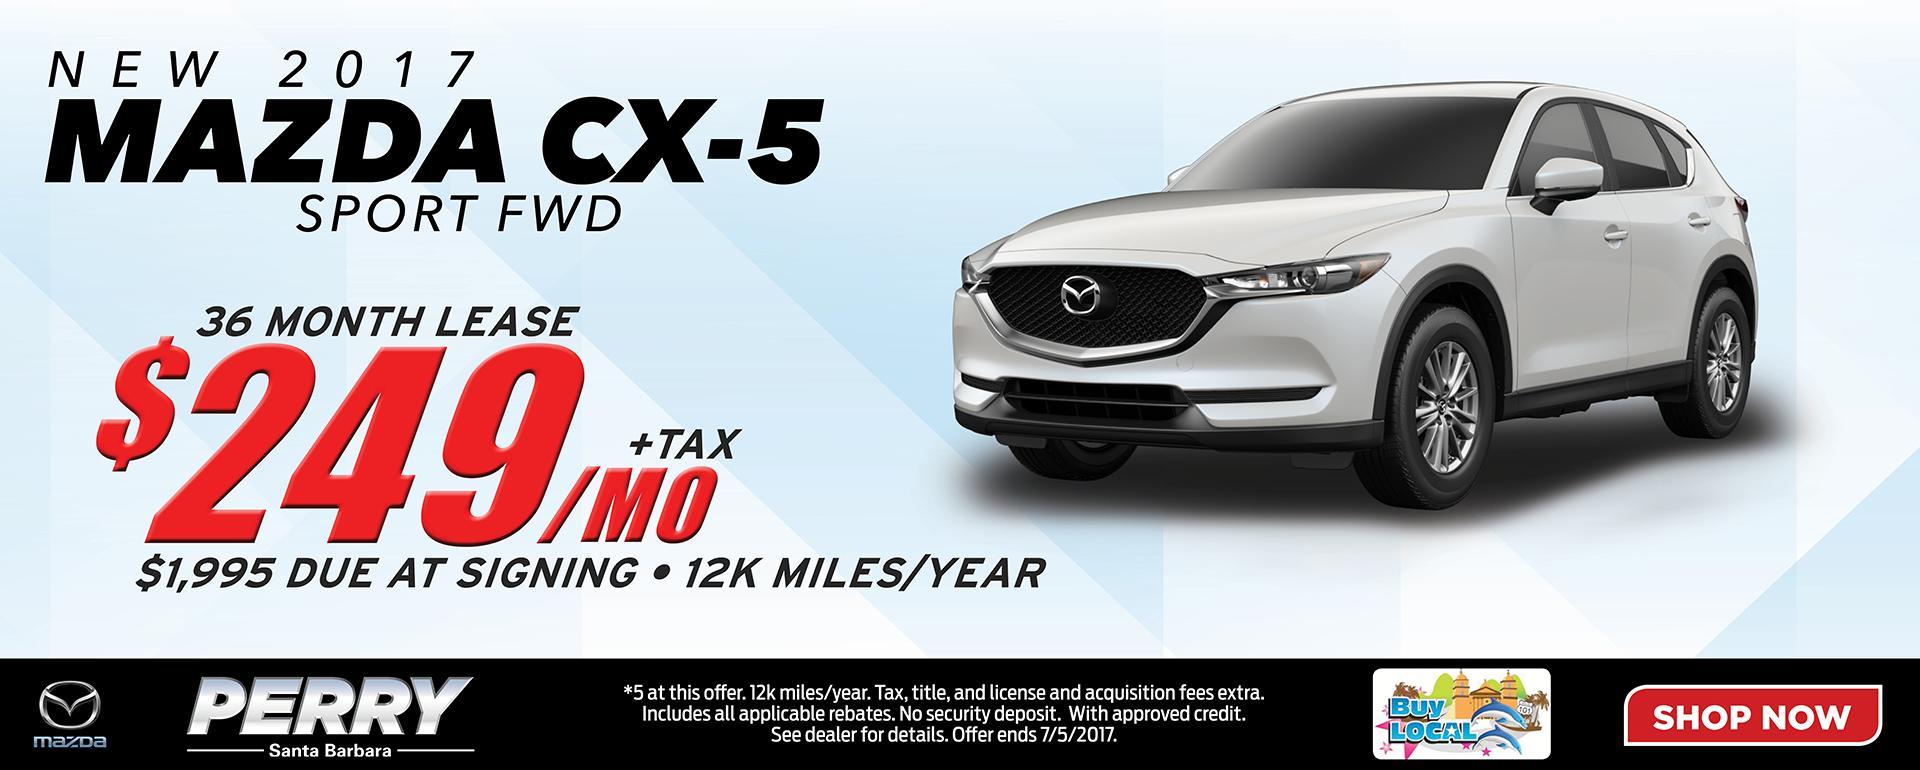 2017 Mazda CX-5 Lease Special